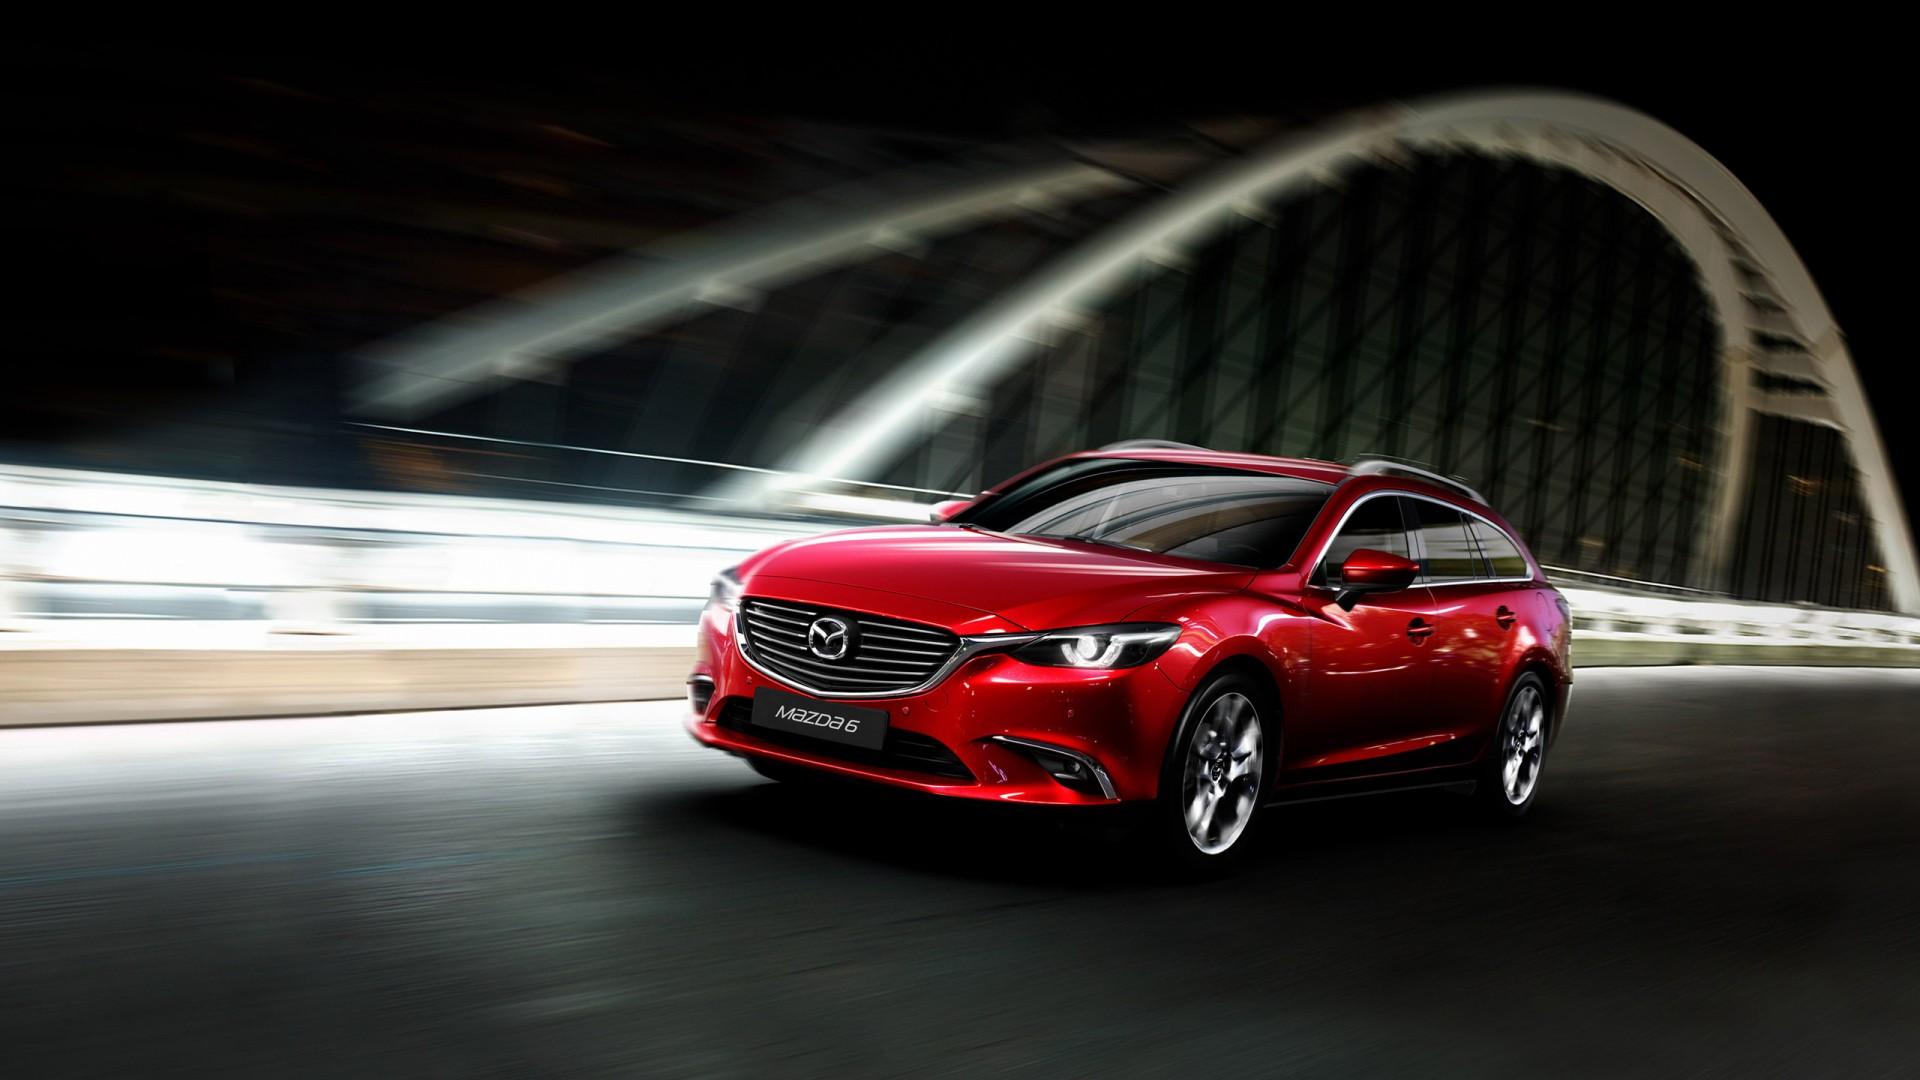 2015 Mazda 6 Wallpaper | HD Car Wallpapers | ID #4967